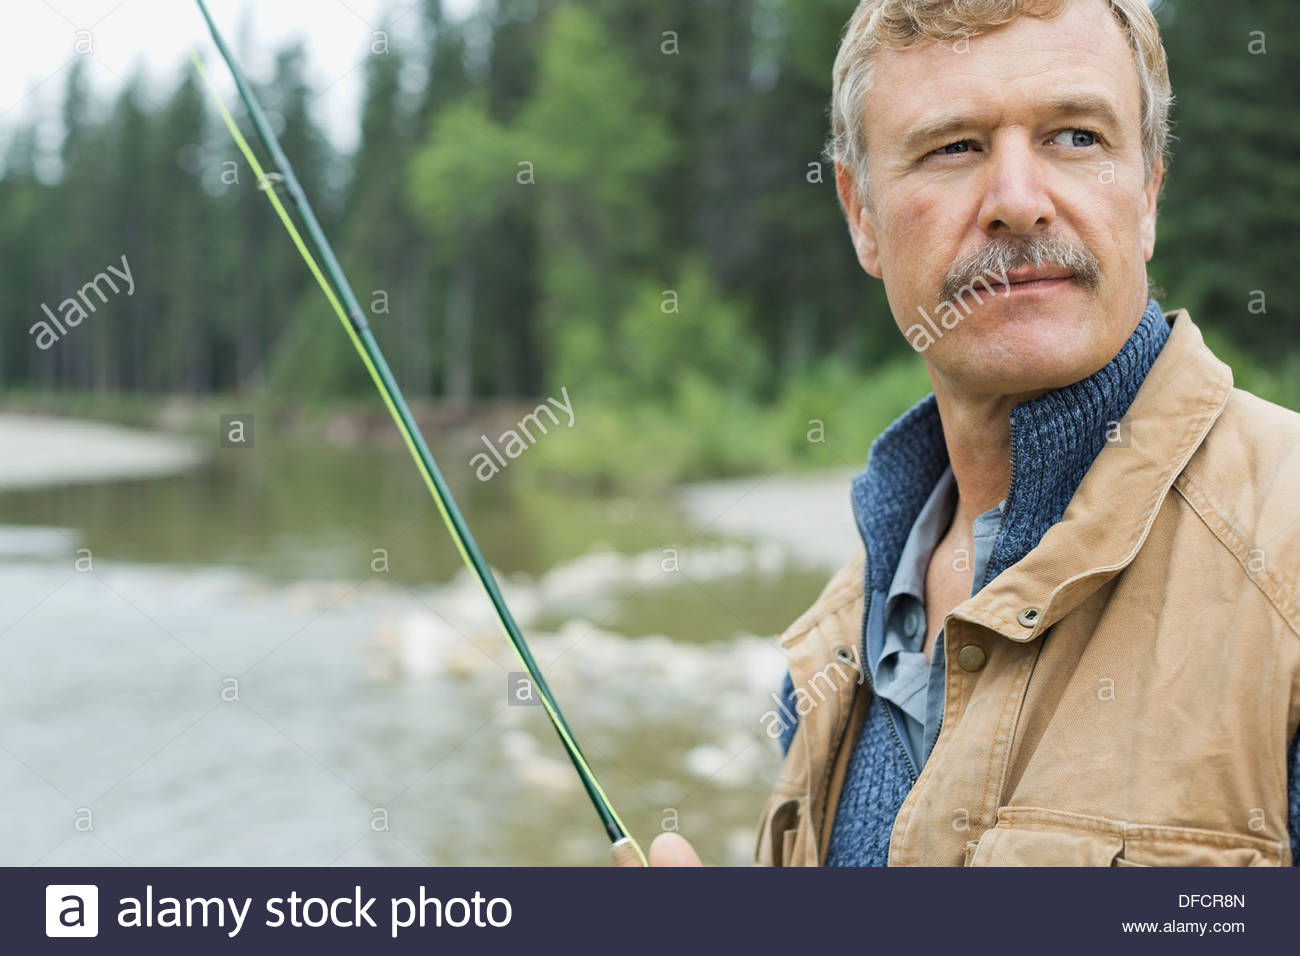 Portrait of mature man fishing - Stock Image